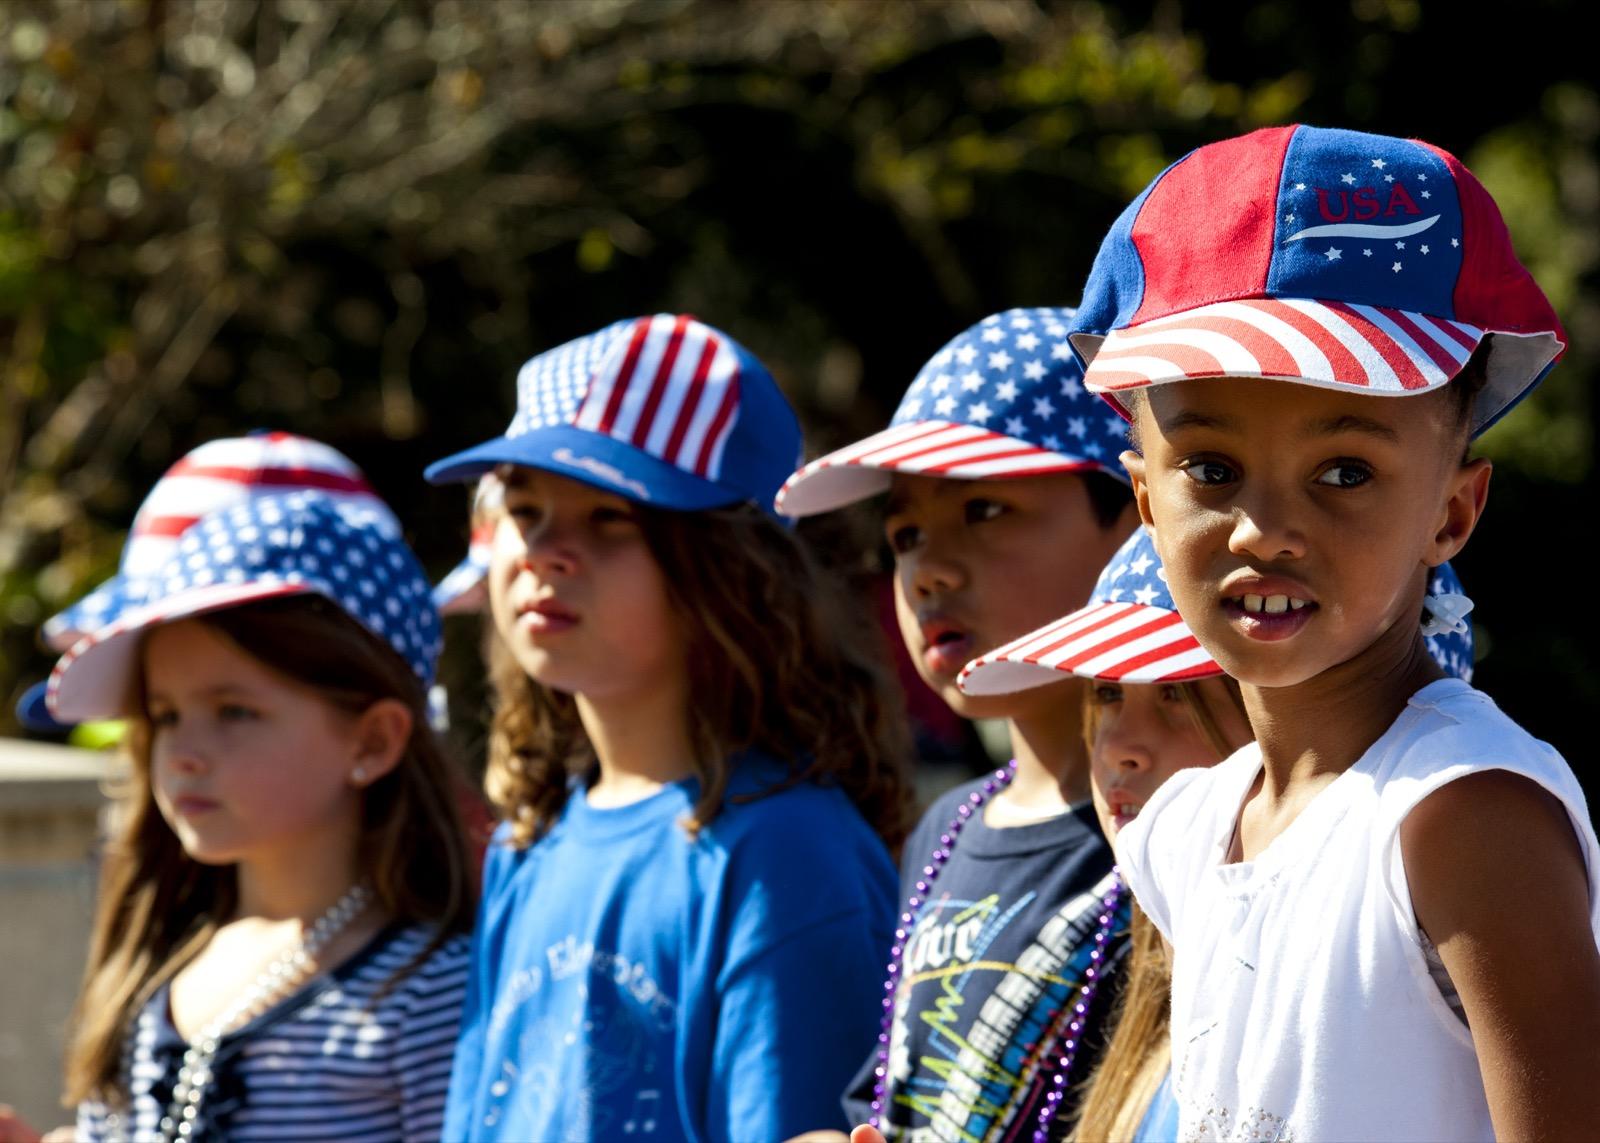 memorial day weekend photo ideas kids in hats